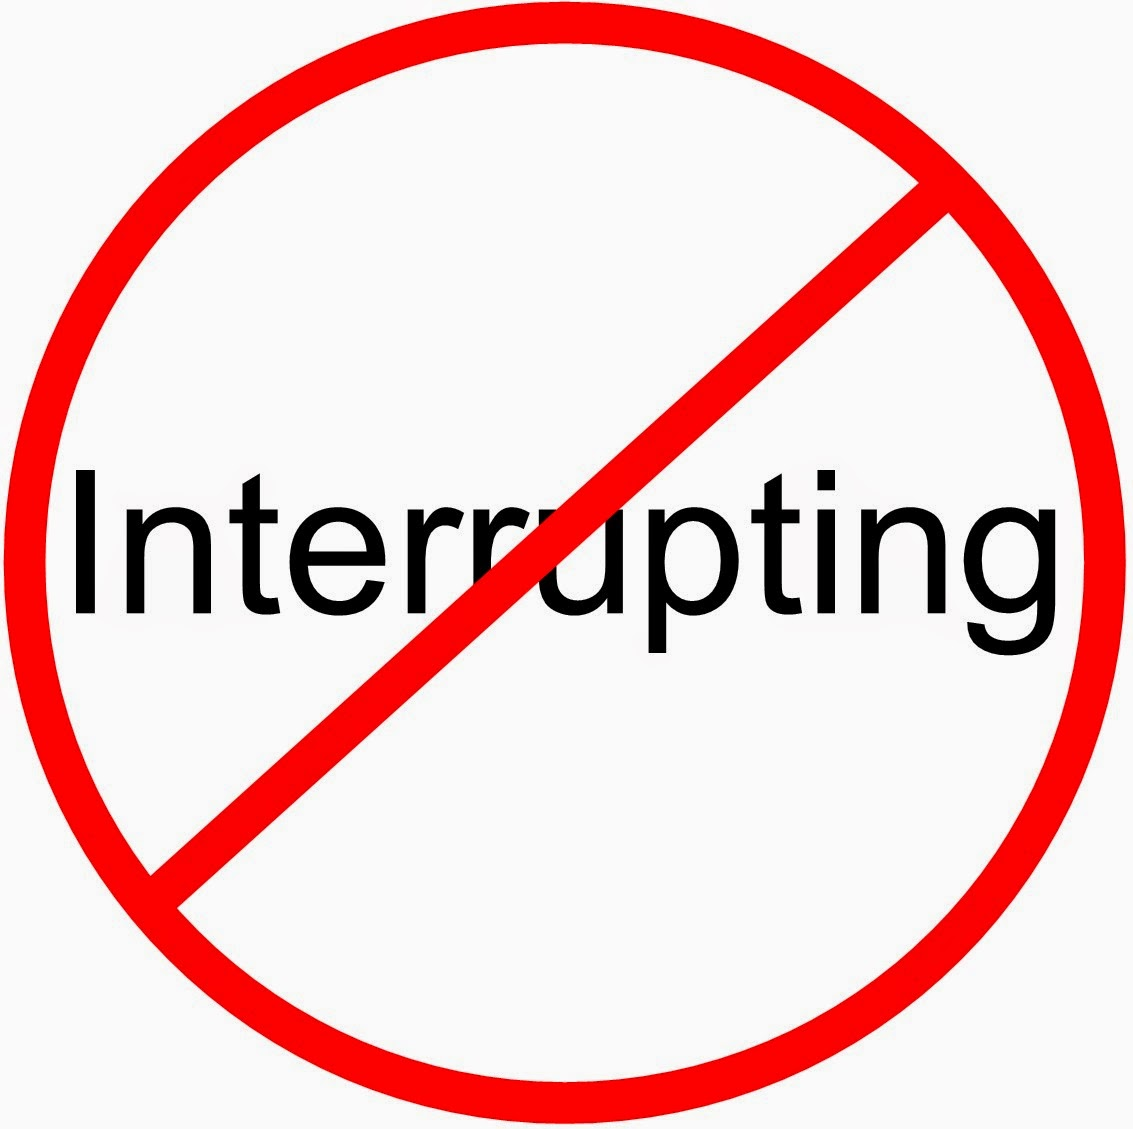 Proverbs 31 Woman: Teaching Children to Not Interrupt